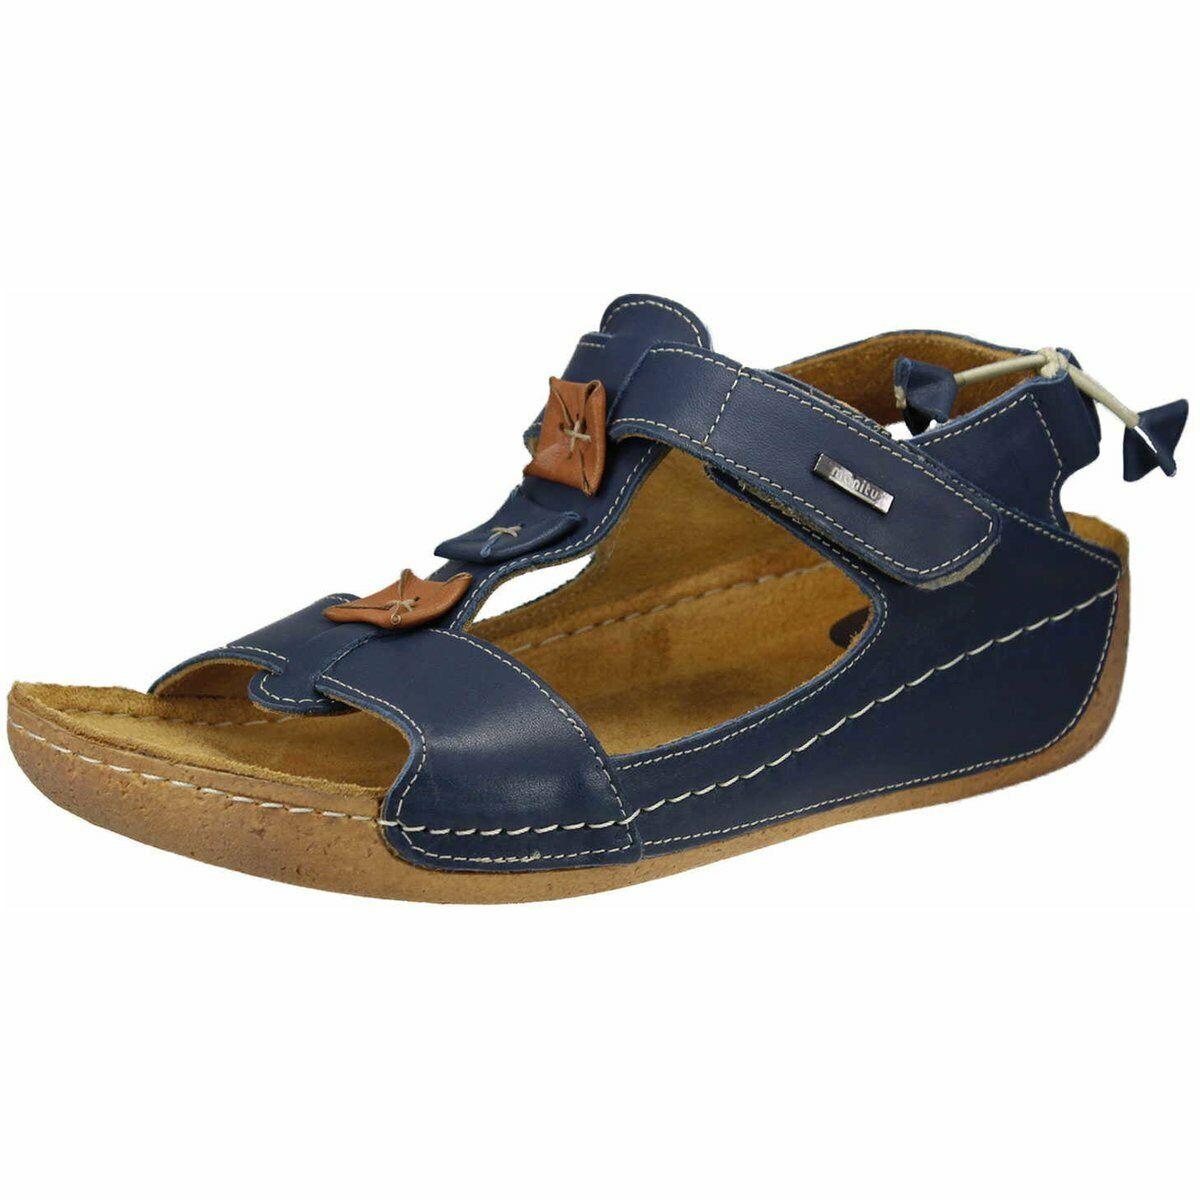 Manitu Damen Sandaletten blau (jeansblau-cognac) 910846-5 blau 682781